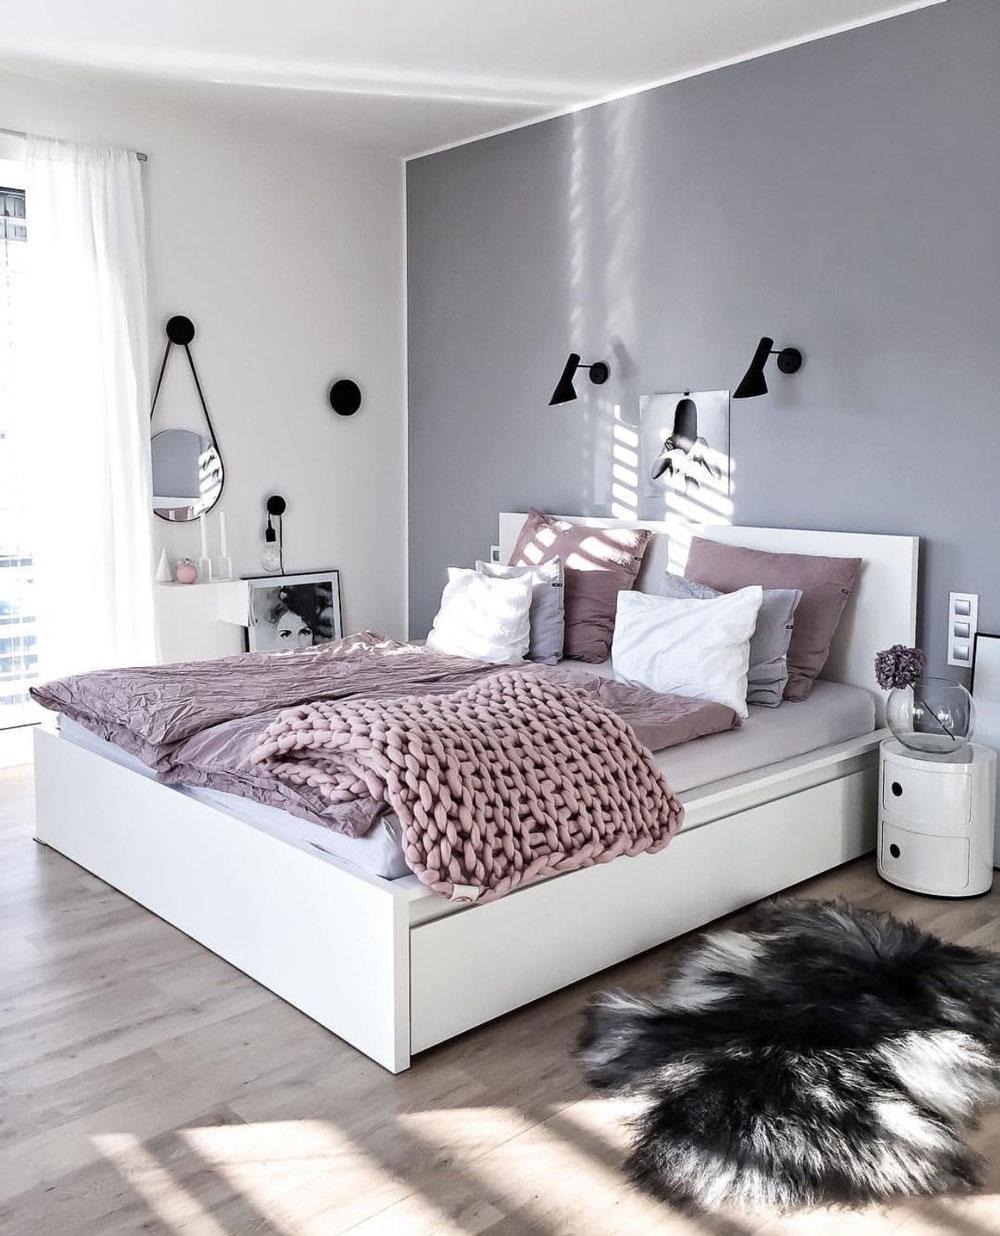 decorasion bedroom design - نکاتی در مورد تزیین اتاق خواب